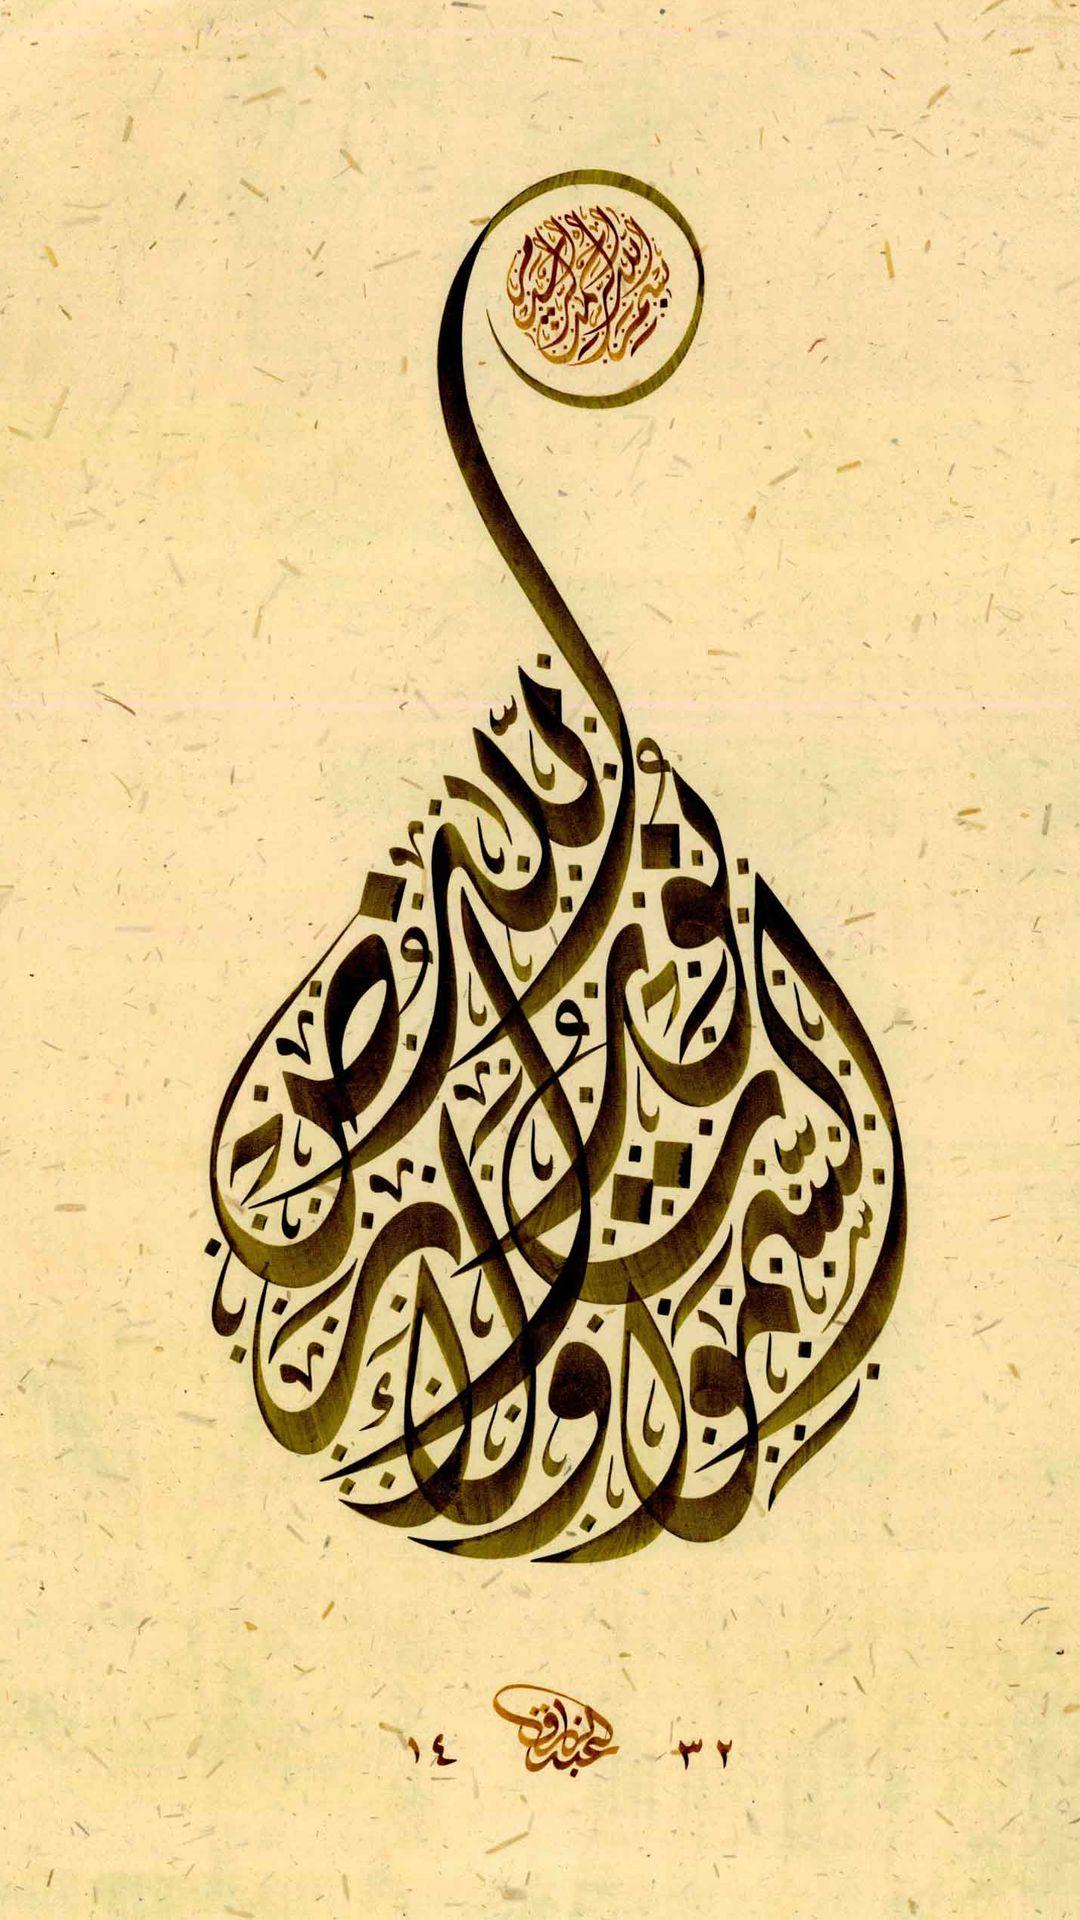 Wallpaper iphone kaligrafi - Best Islamic Wallpaper For 5 Inch Mobile Phone 3 Of 7